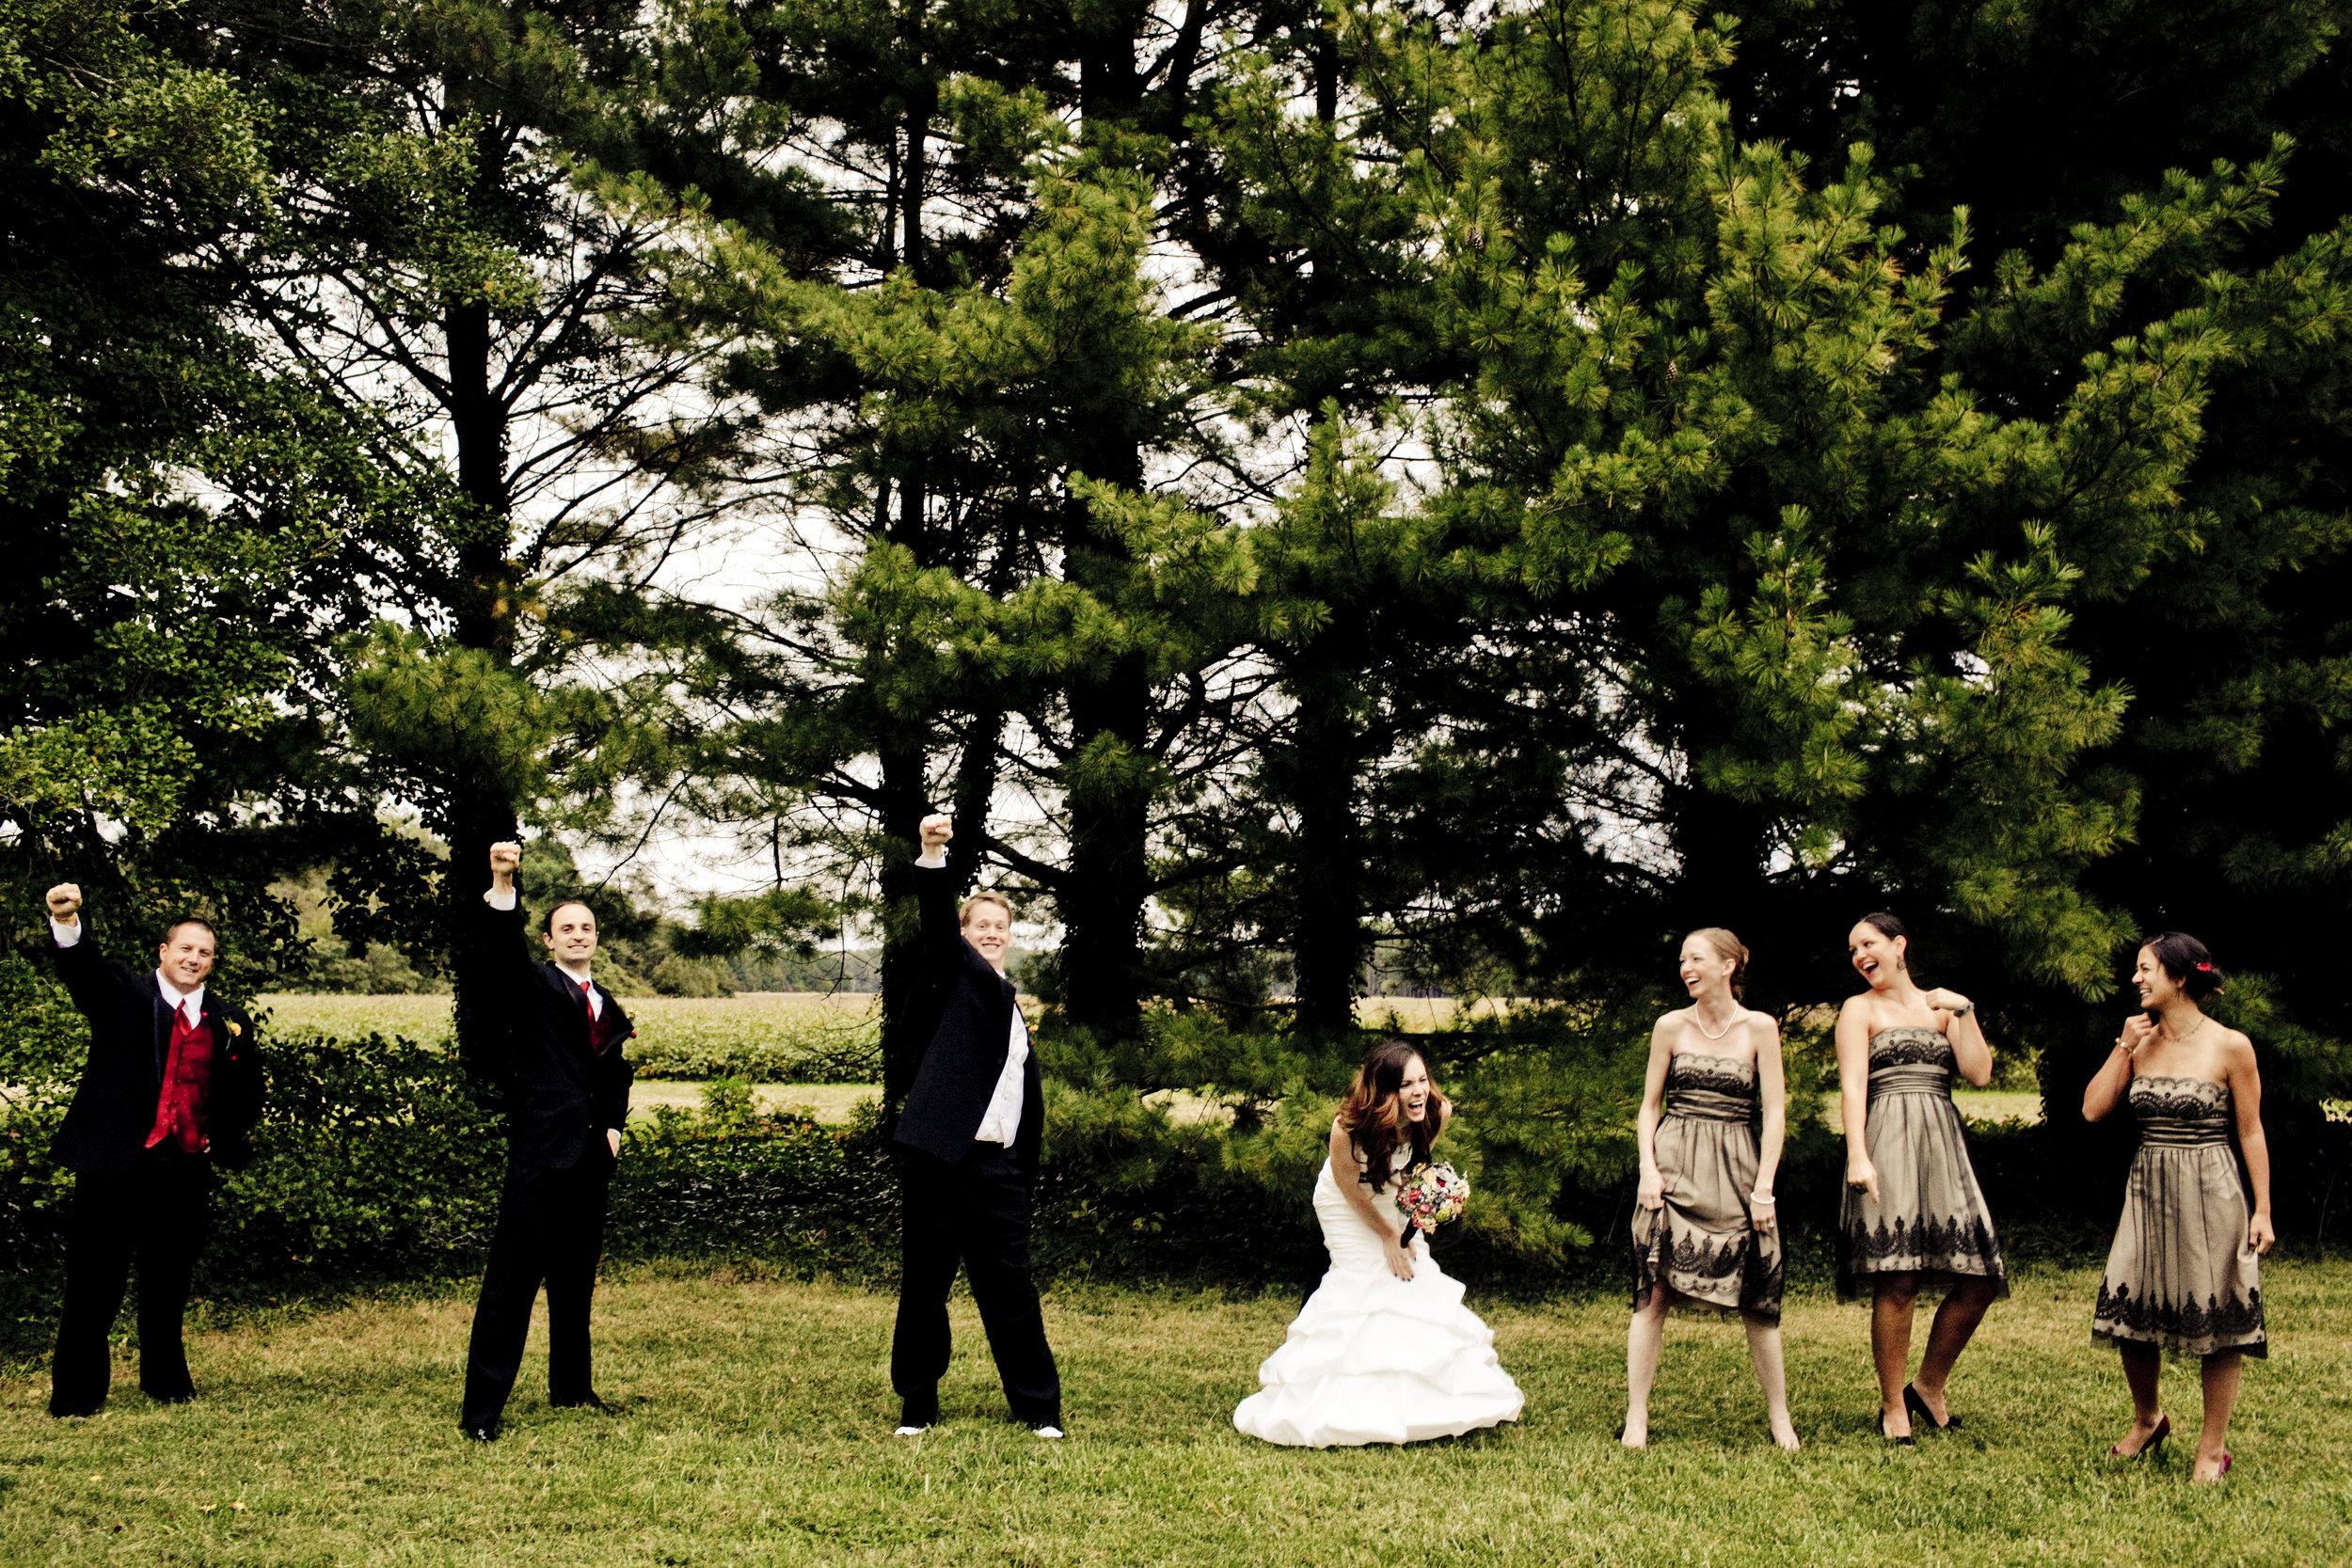 0023_100712 172 metcalf wedding edited.JPG